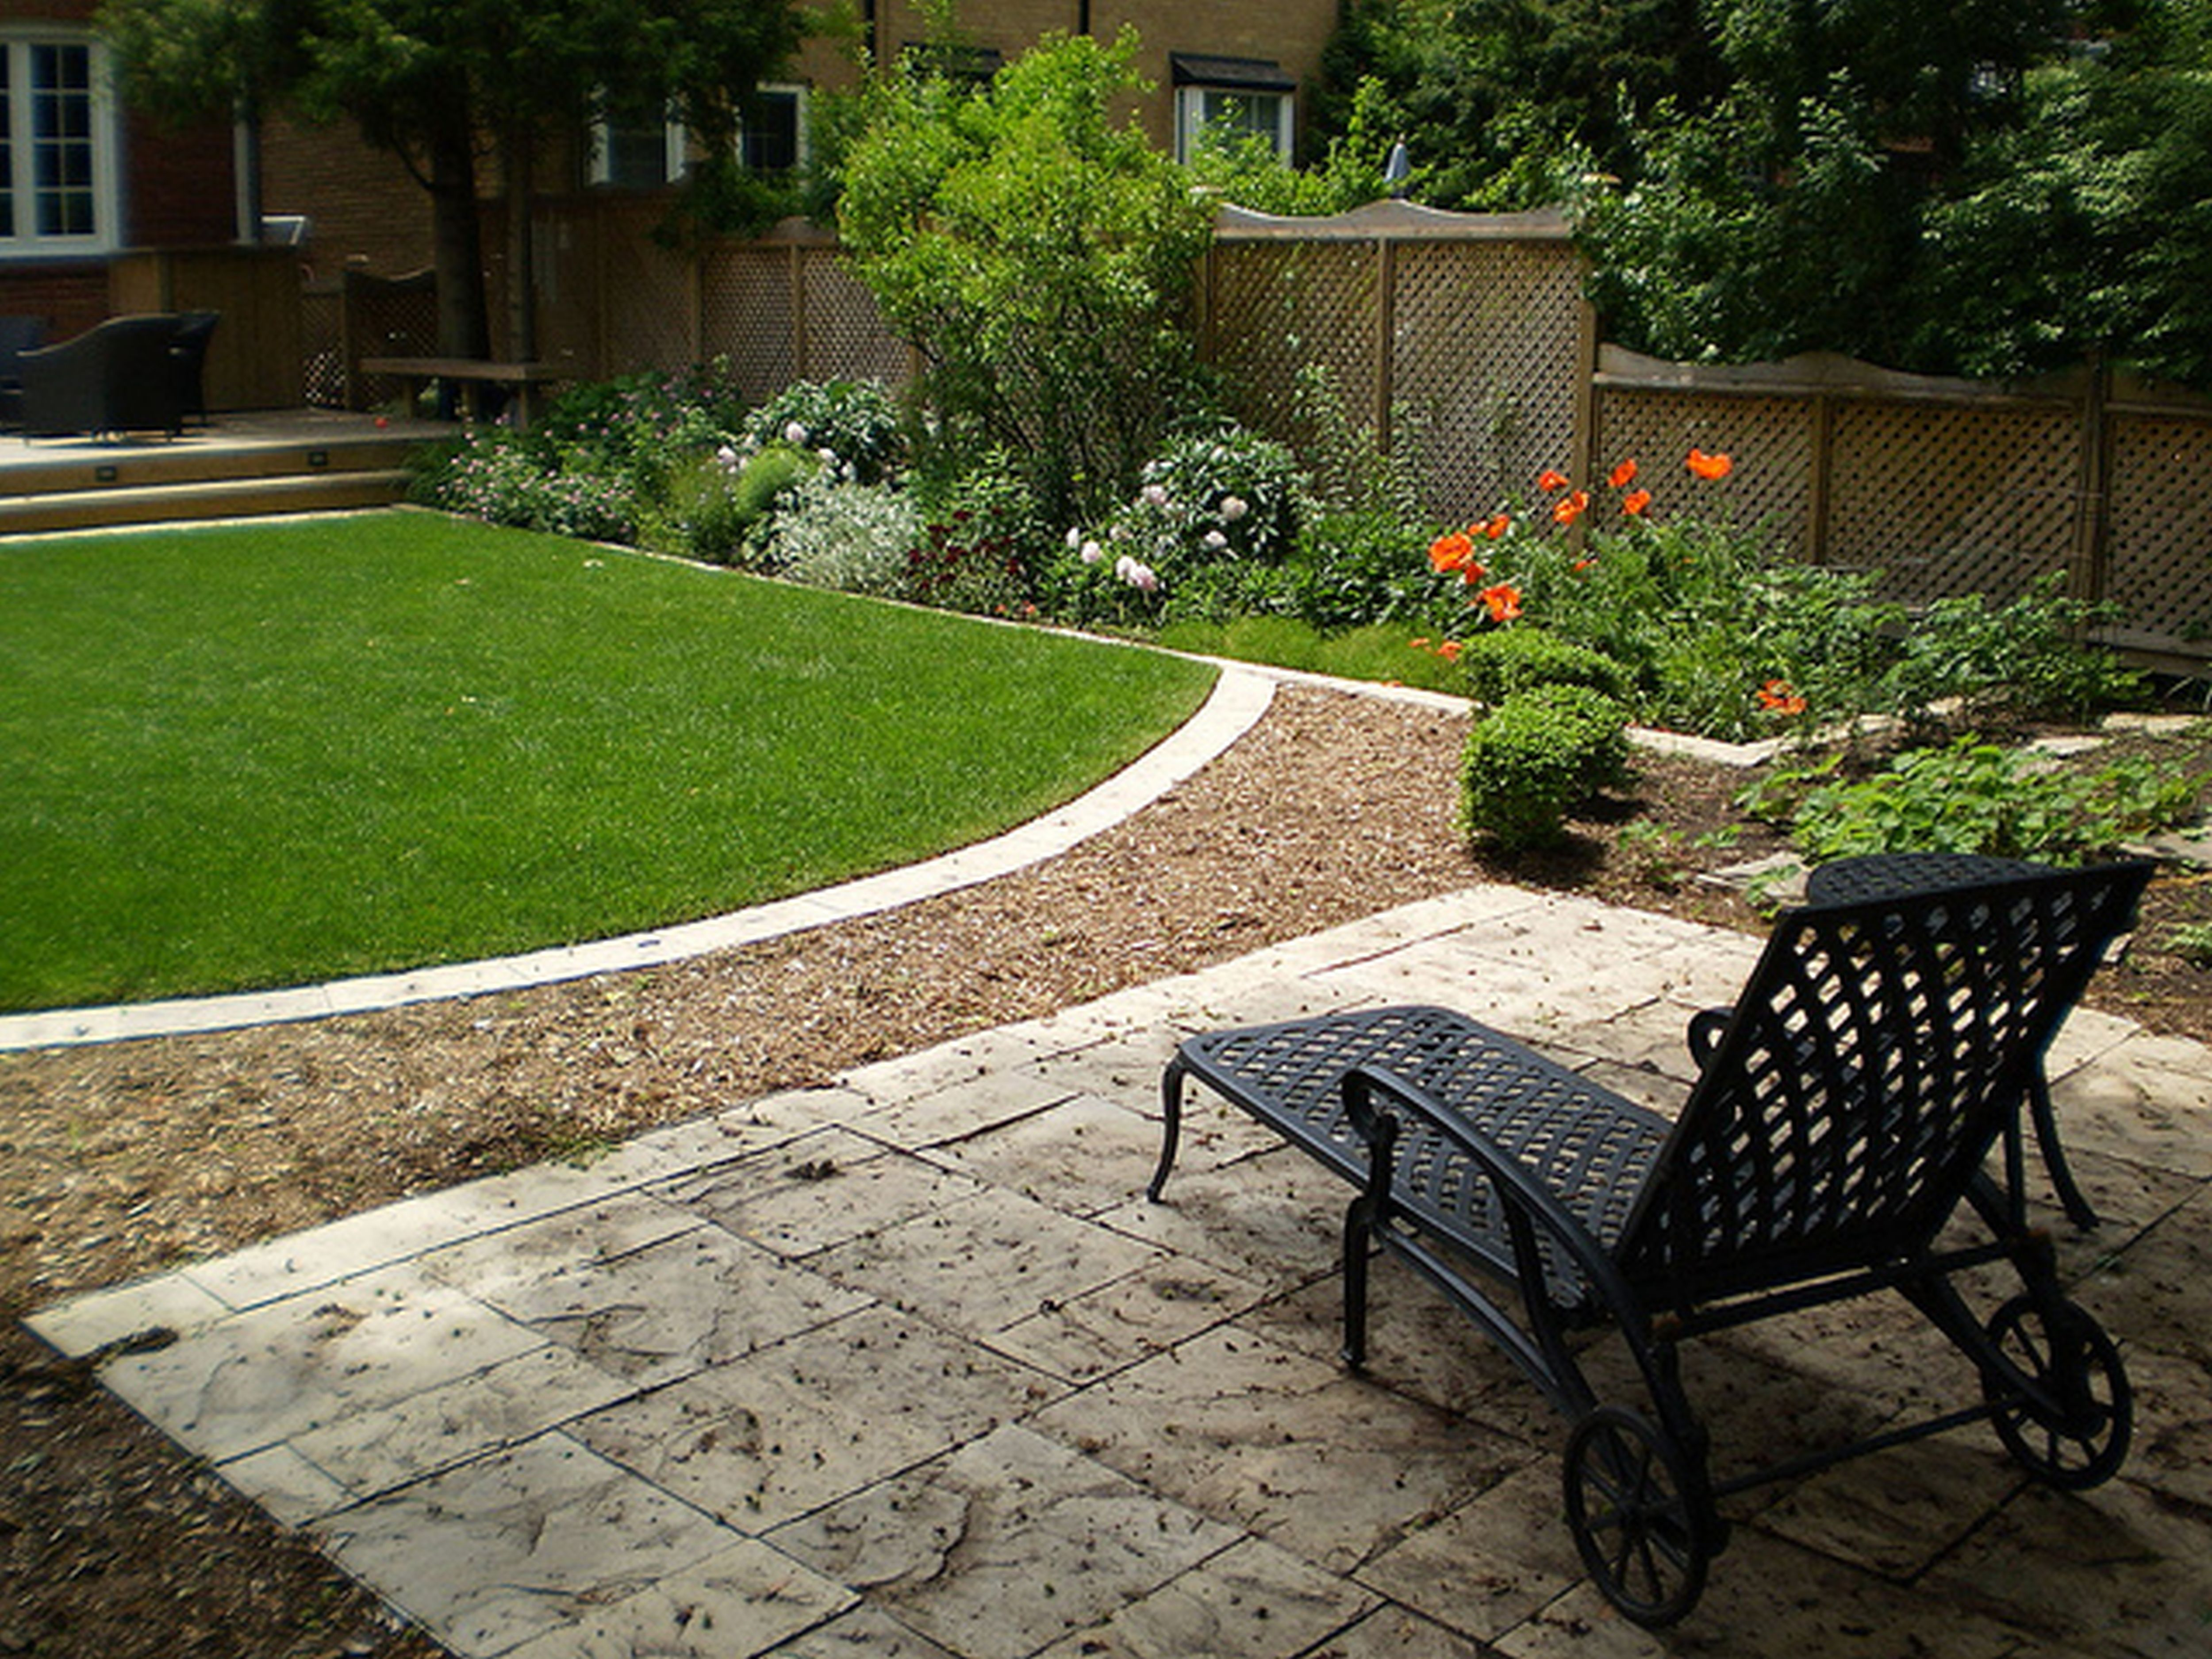 small yard garden design ideas photo - 10